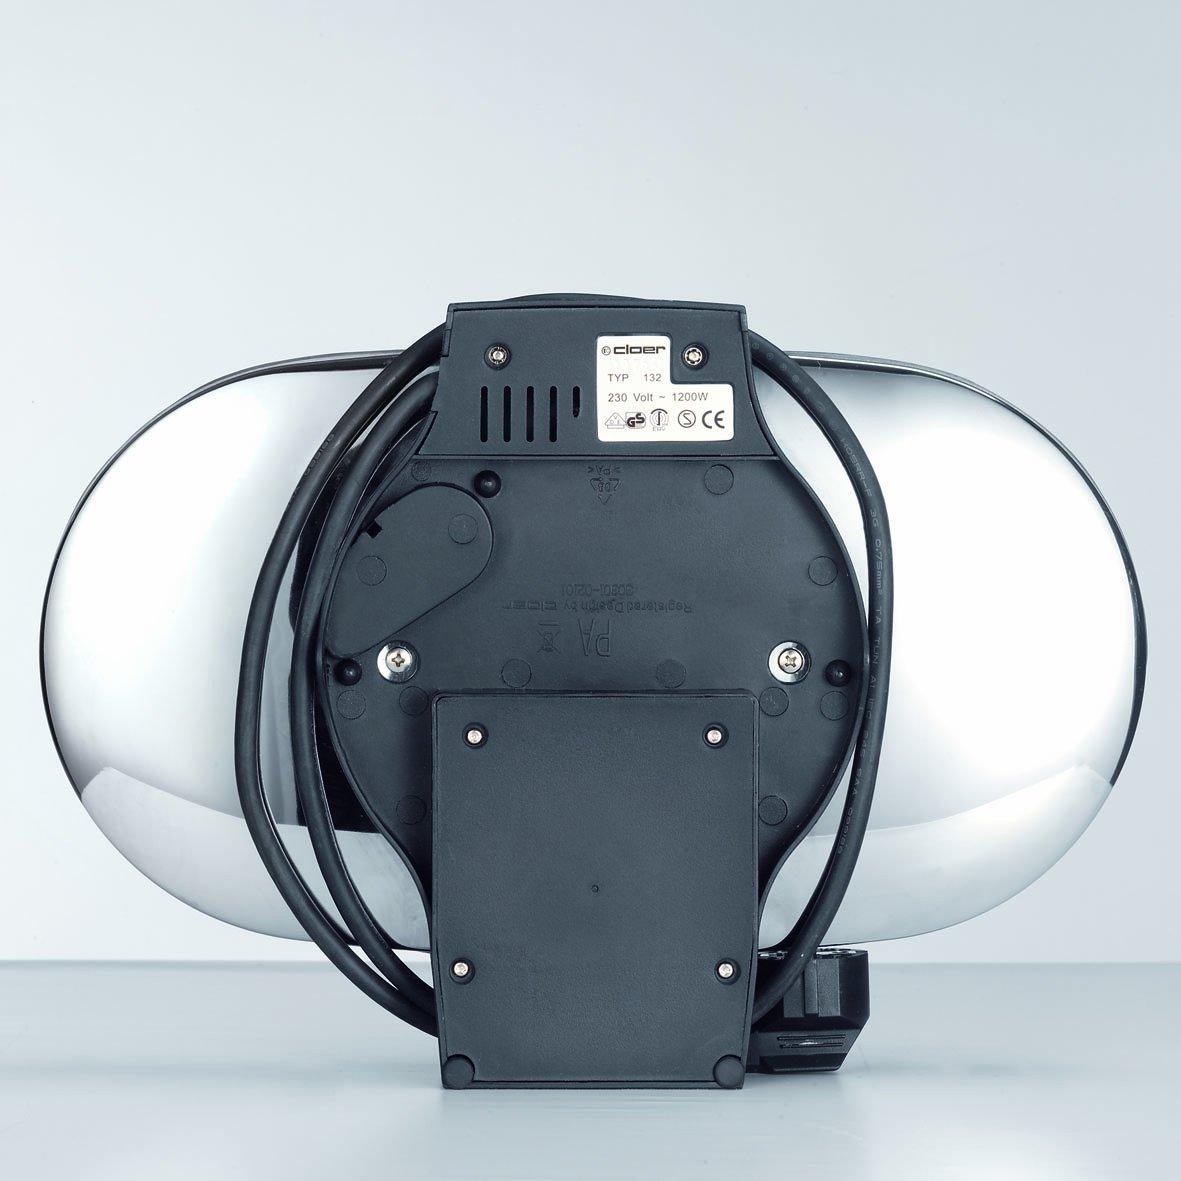 Binghotfire Pair ABS Rear Bumper Reflector For Skoda For Octavia 1Z0945105 1Z0945106 red